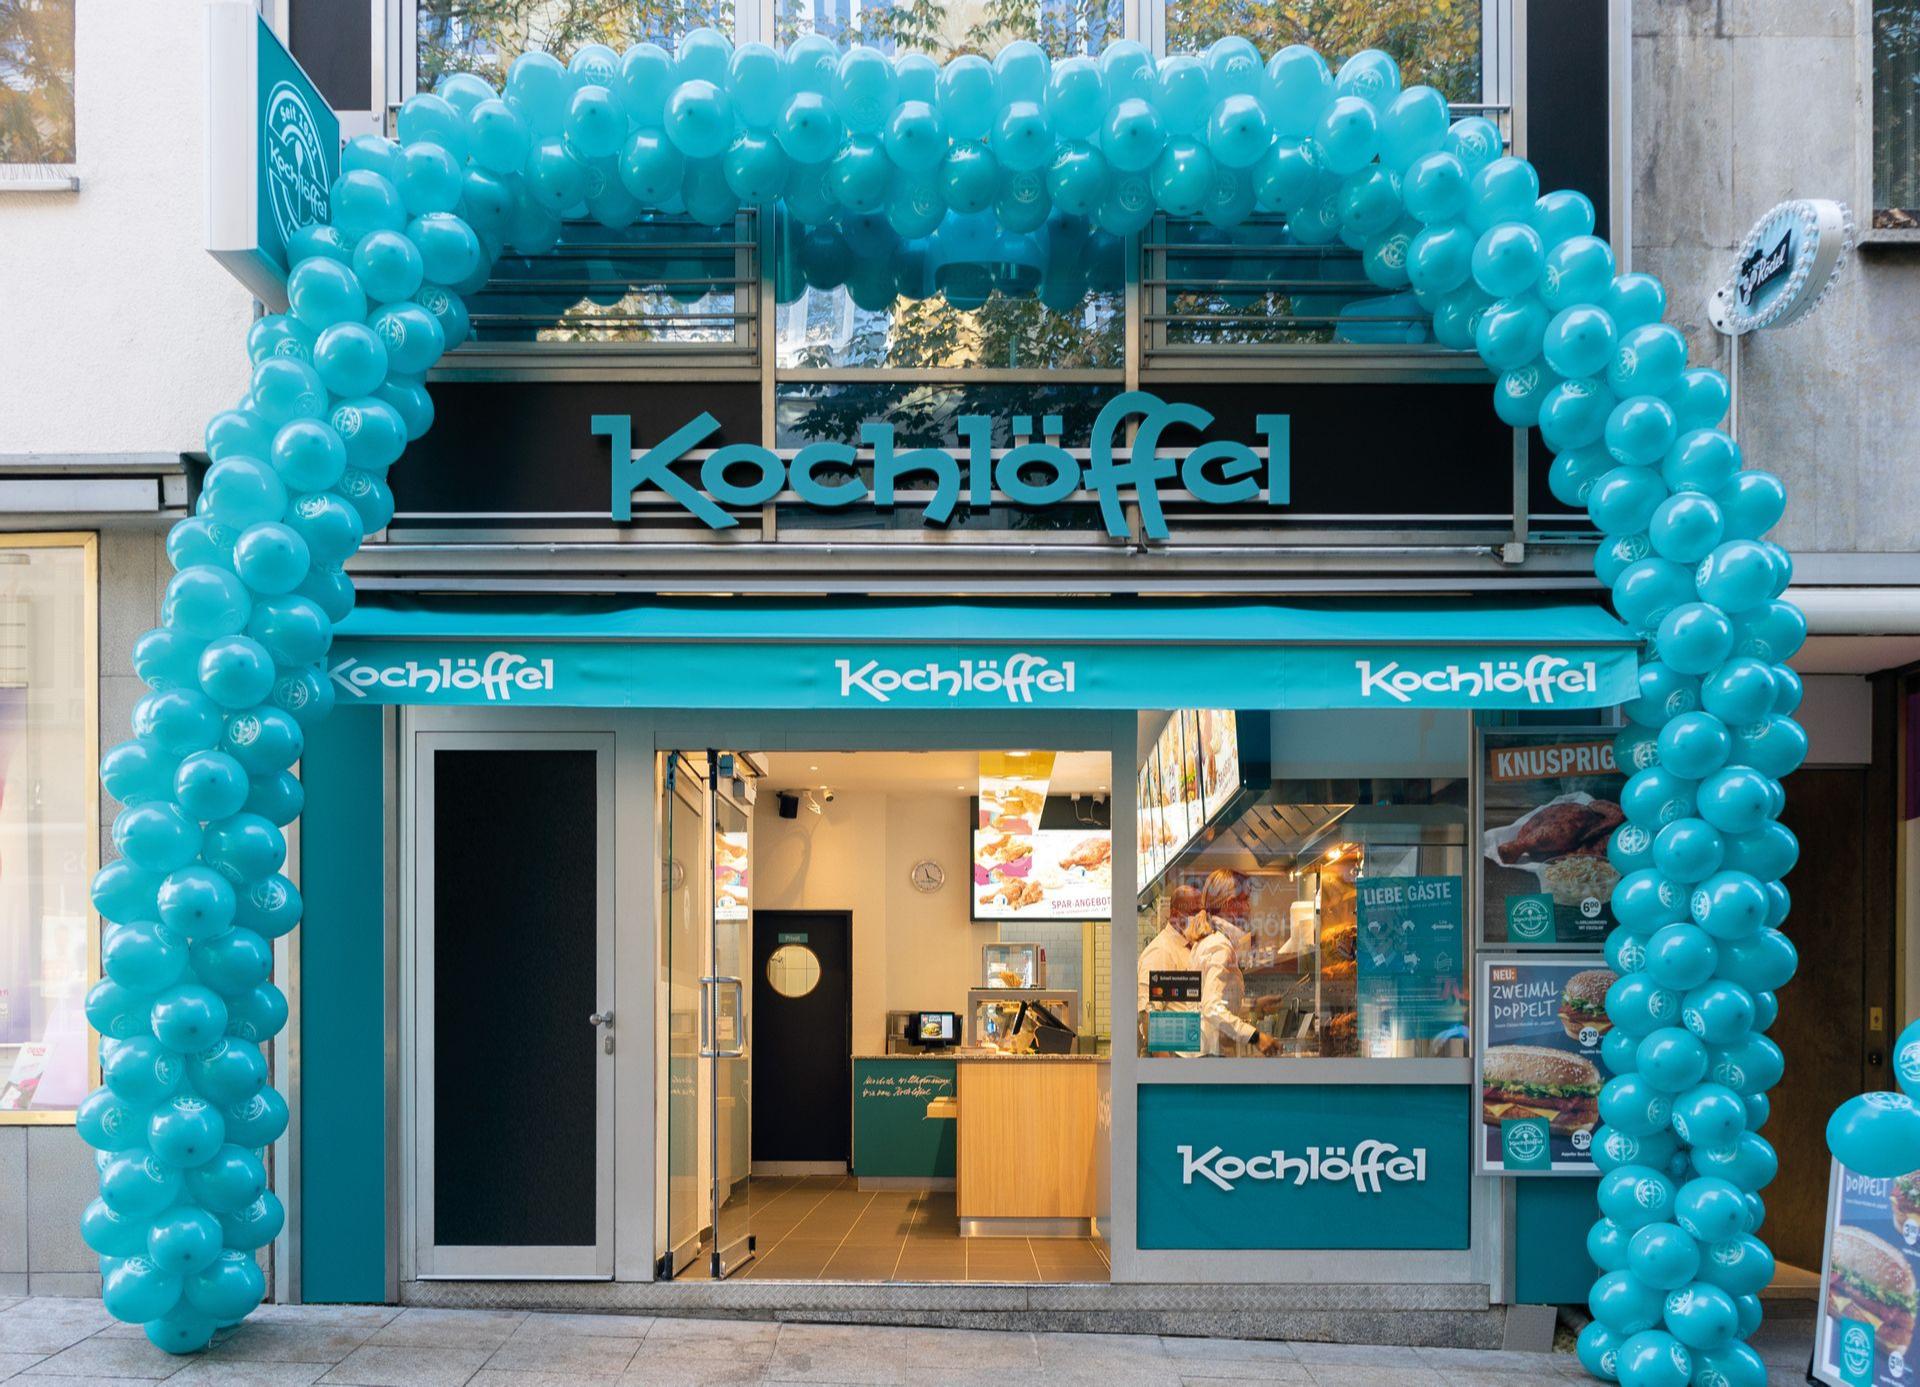 Kochlöffel: Expansion, Tradition und Trends